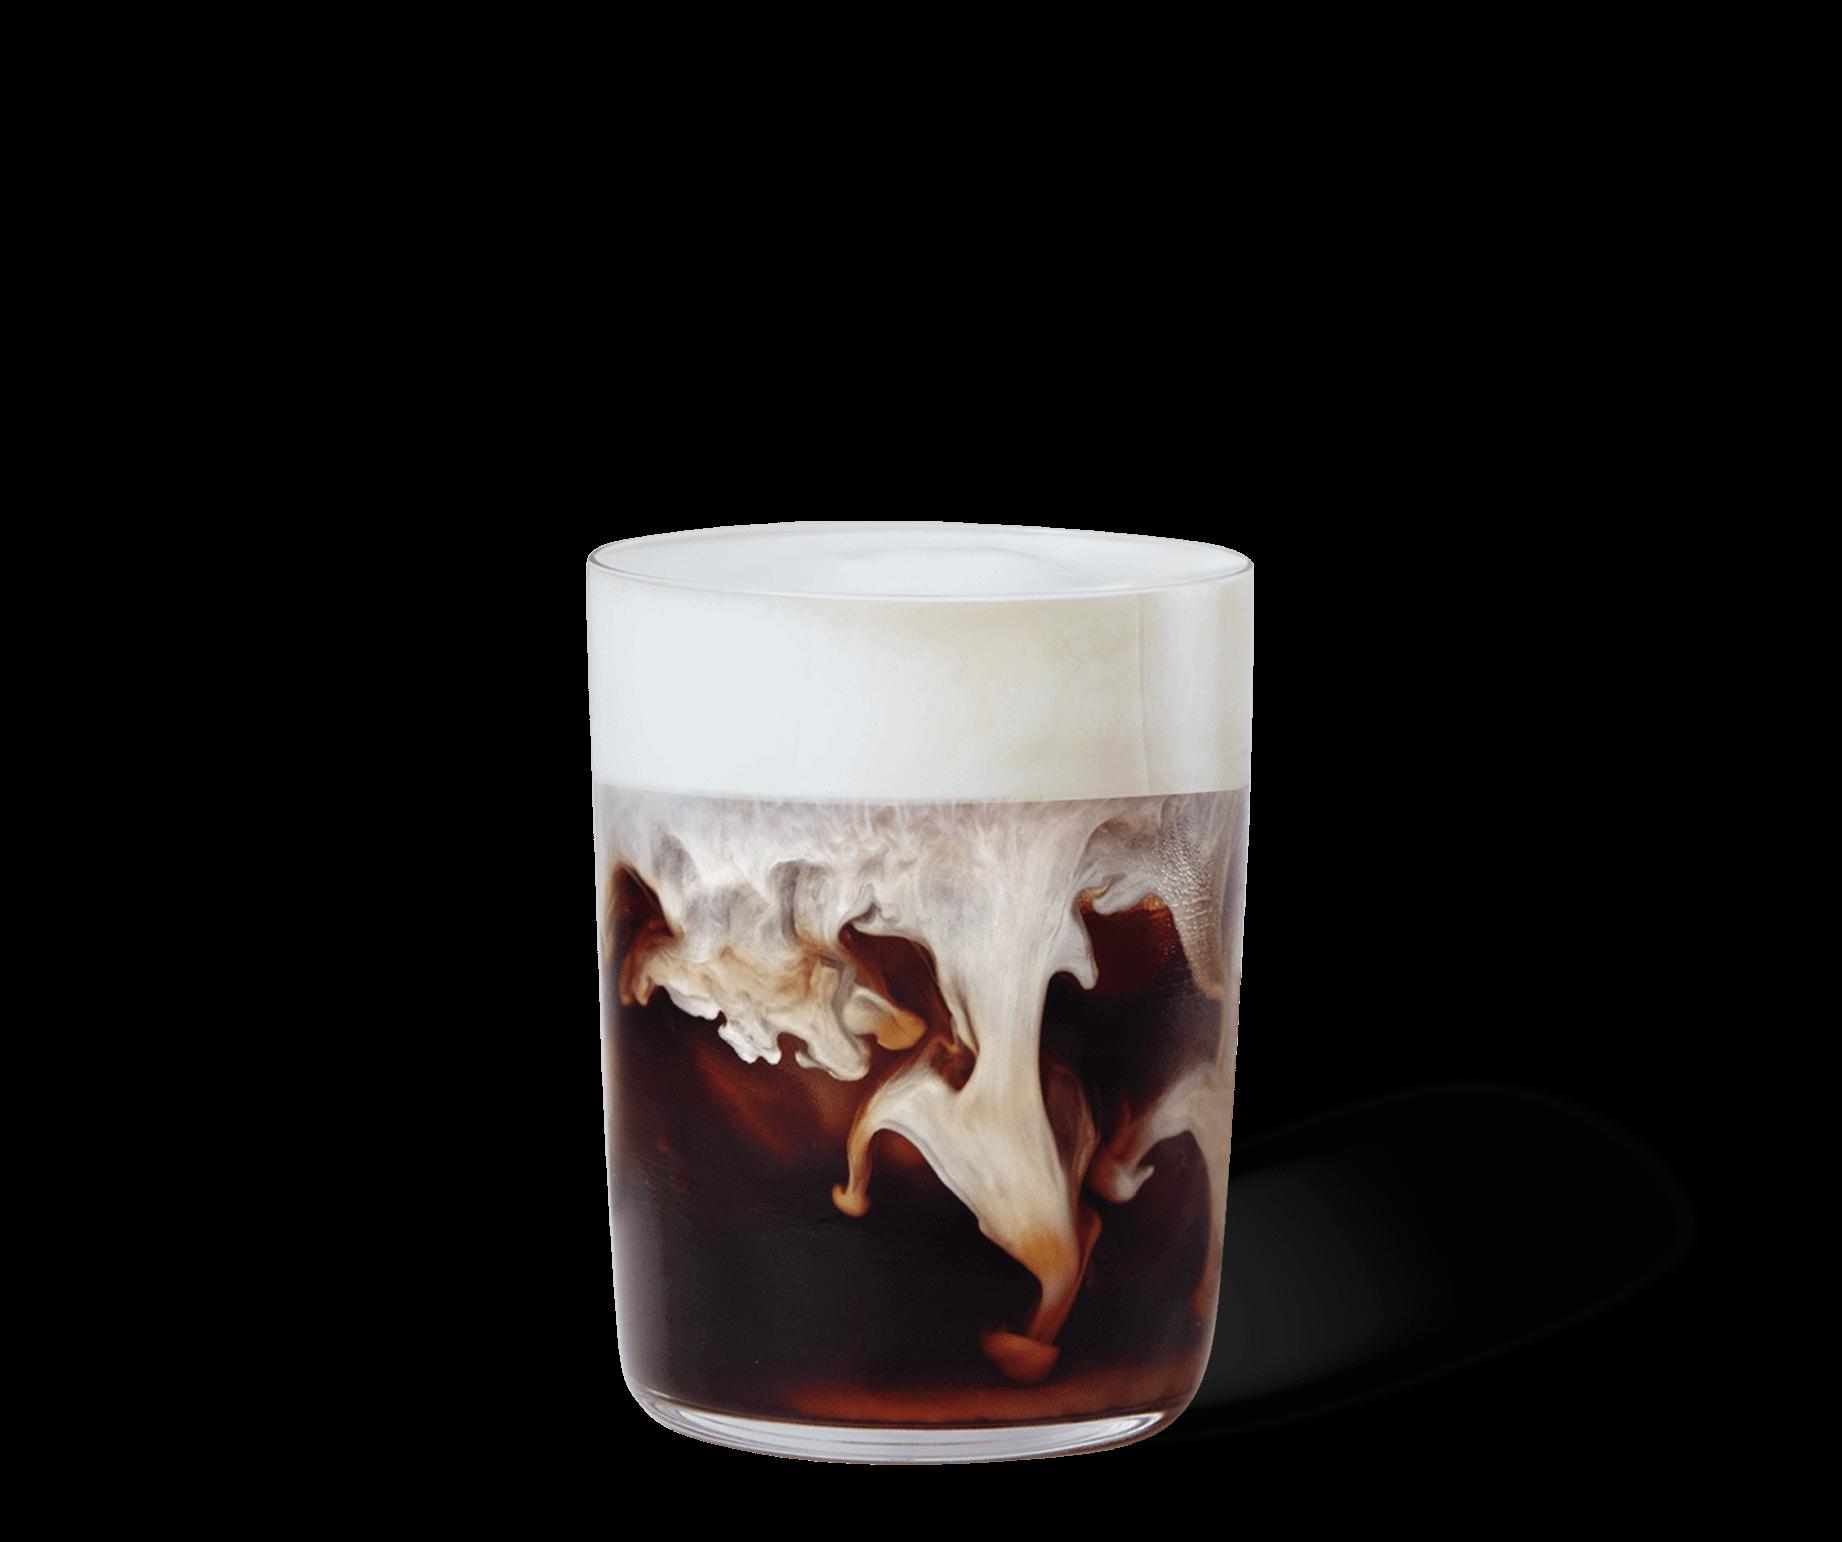 Caramel latte with Vanilla